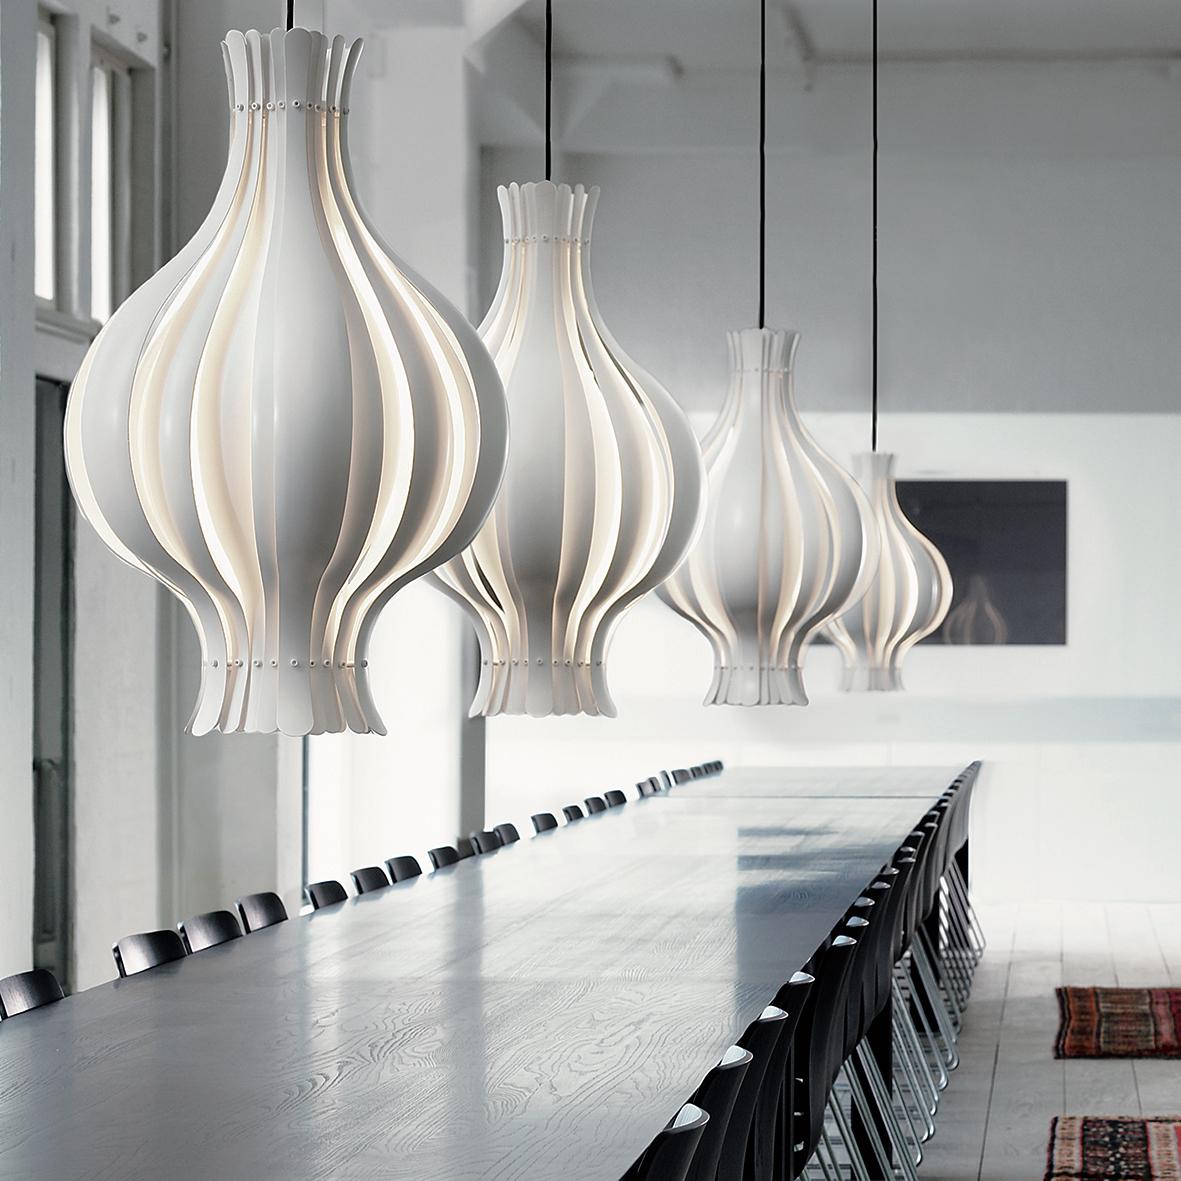 Interior designs medium size vertically growing onions growing onions - Verpan